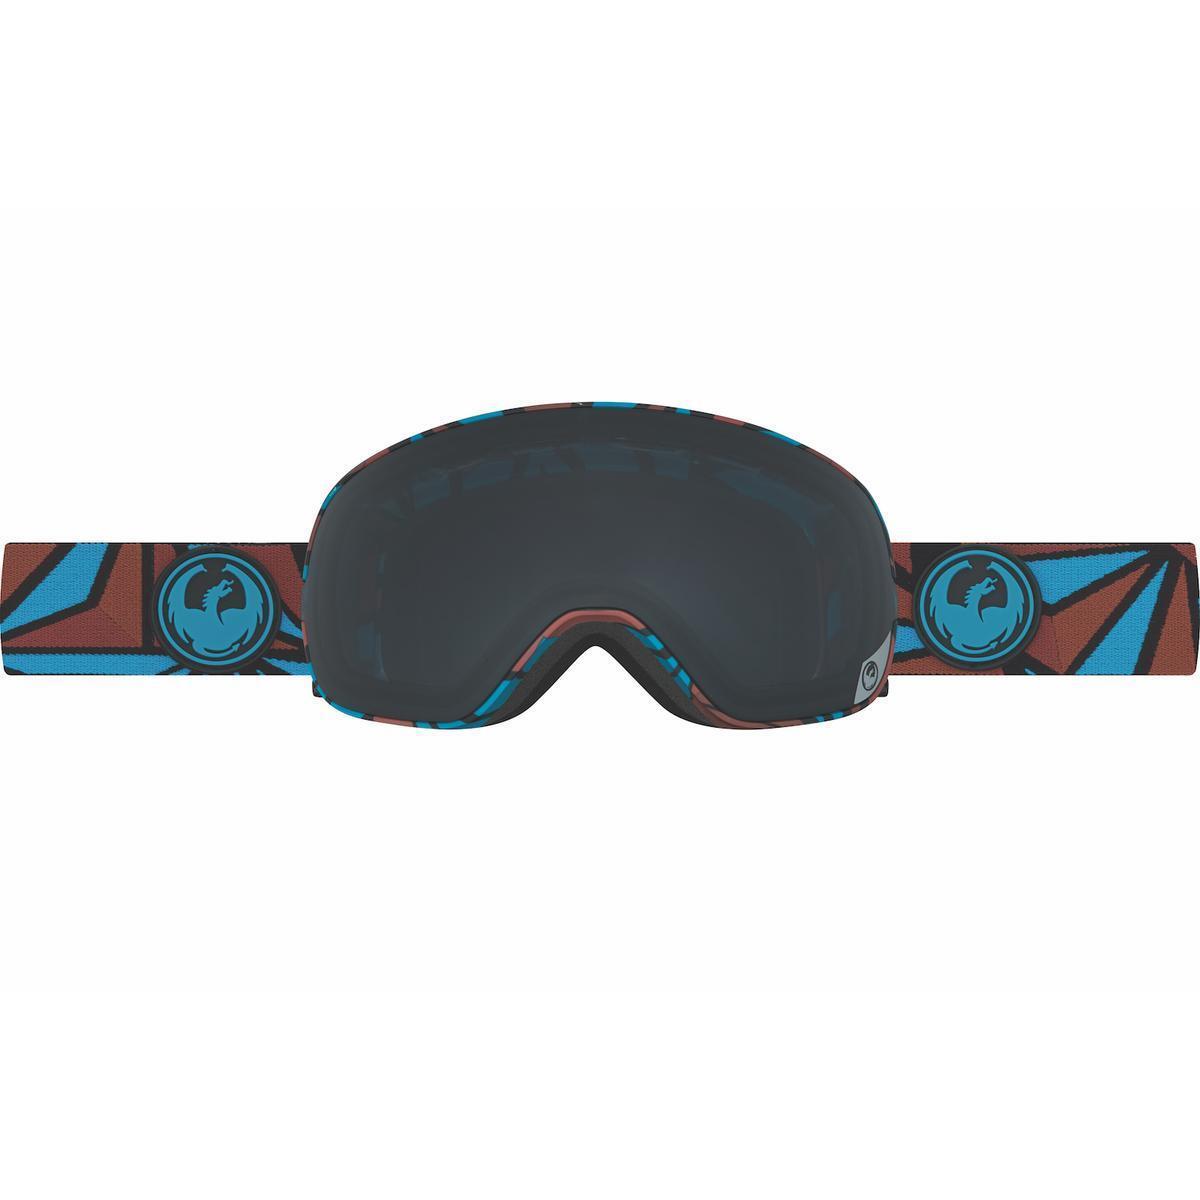 Dragon X2s Goggles Structure Dark Smoke + Yellow bluee Ion